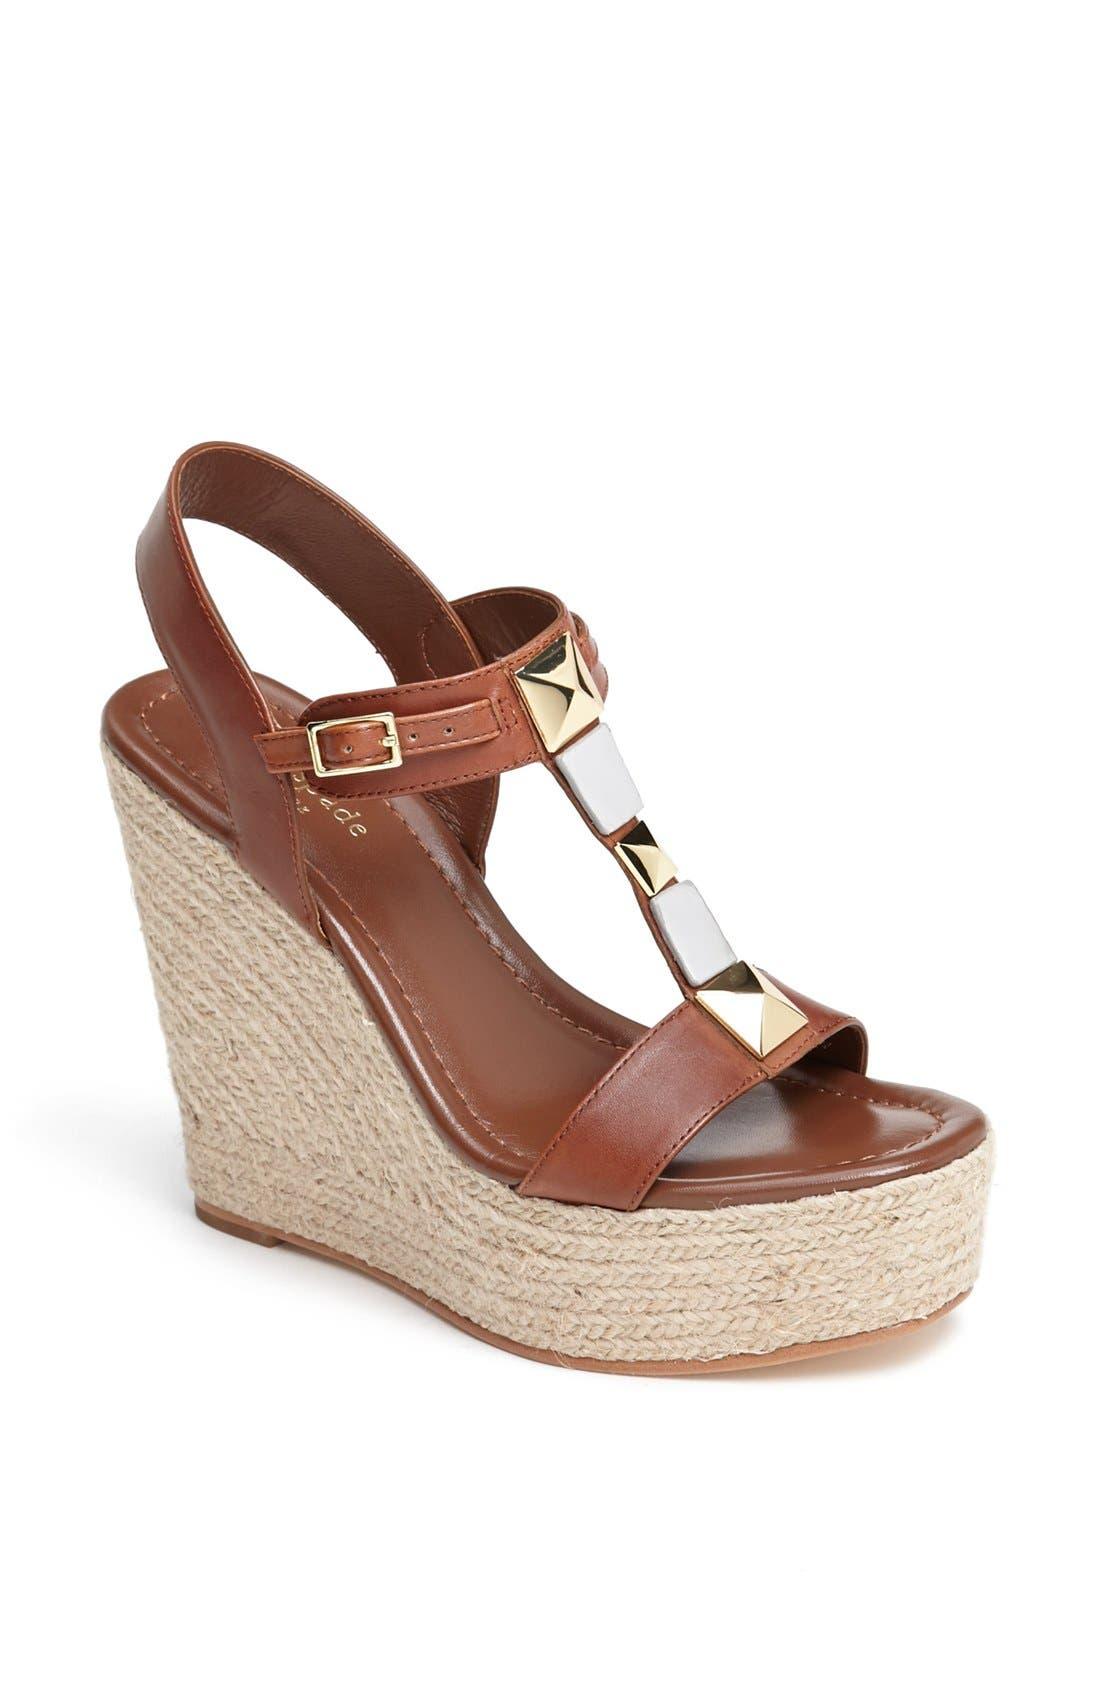 Alternate Image 1 Selected - kate spade new york 'luxe' platform espadrille sandal